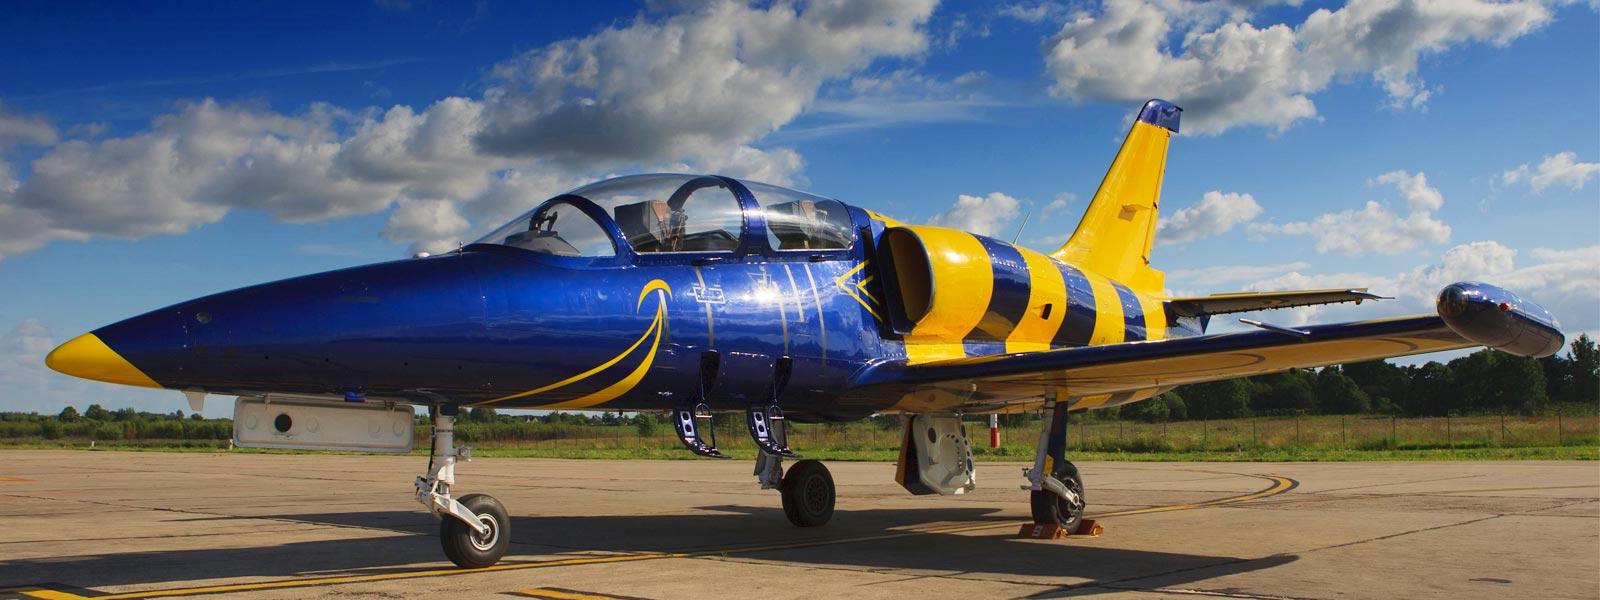 Fly an L-39 Albatros